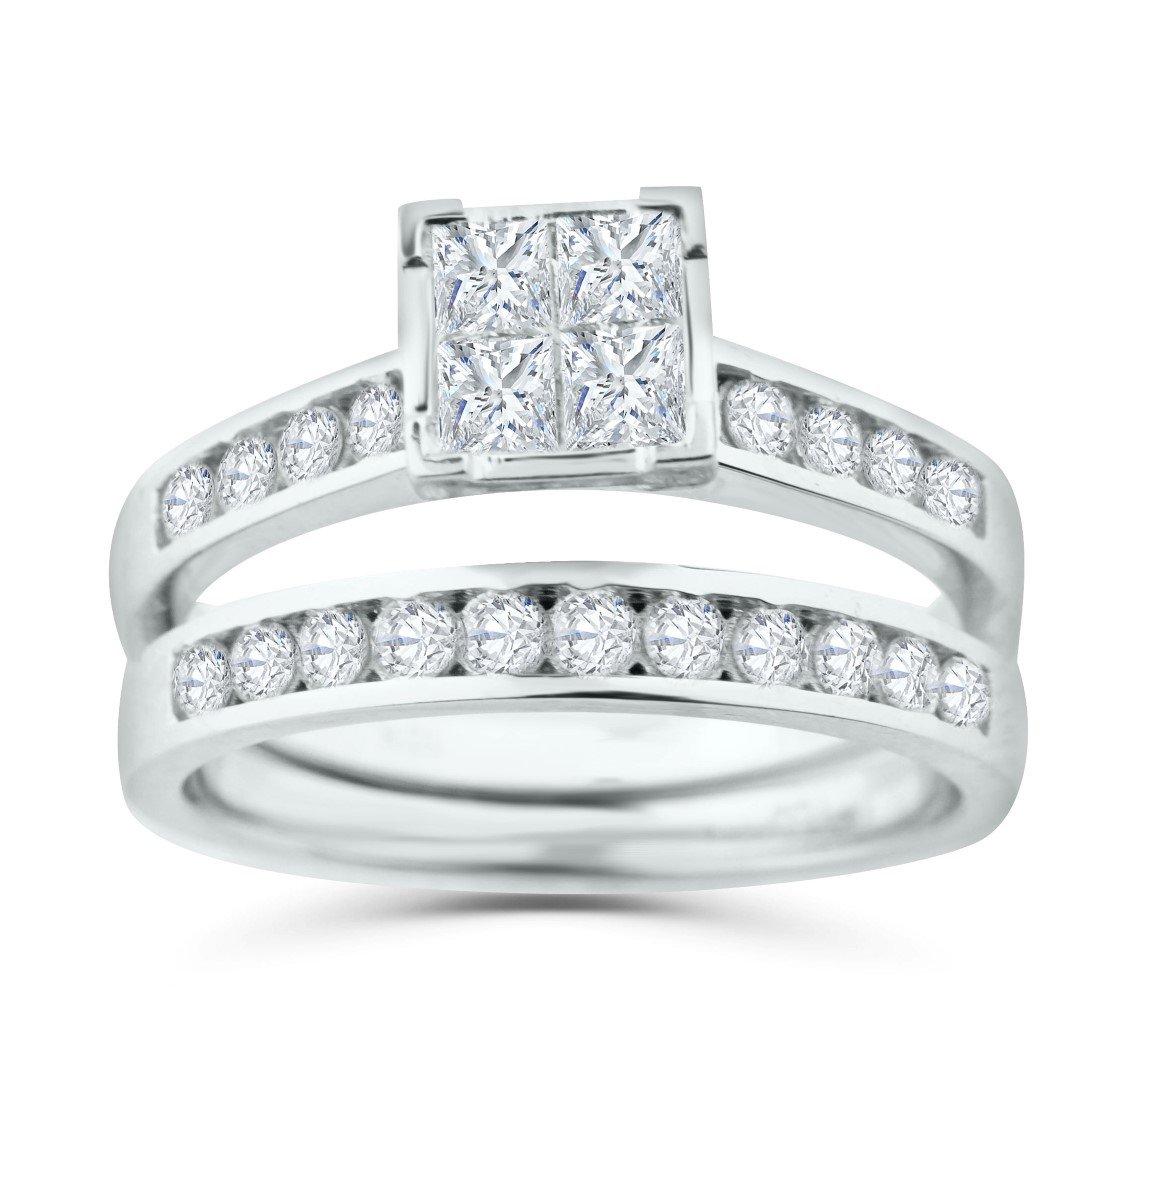 Diamond Bridal Set 10K Gold Engagement Ring / Wedding Ring Set Princess Cut White Gold 10k 2pc Set (1/2ctw, i2/i3, I/j) (white-gold, 10) (6)